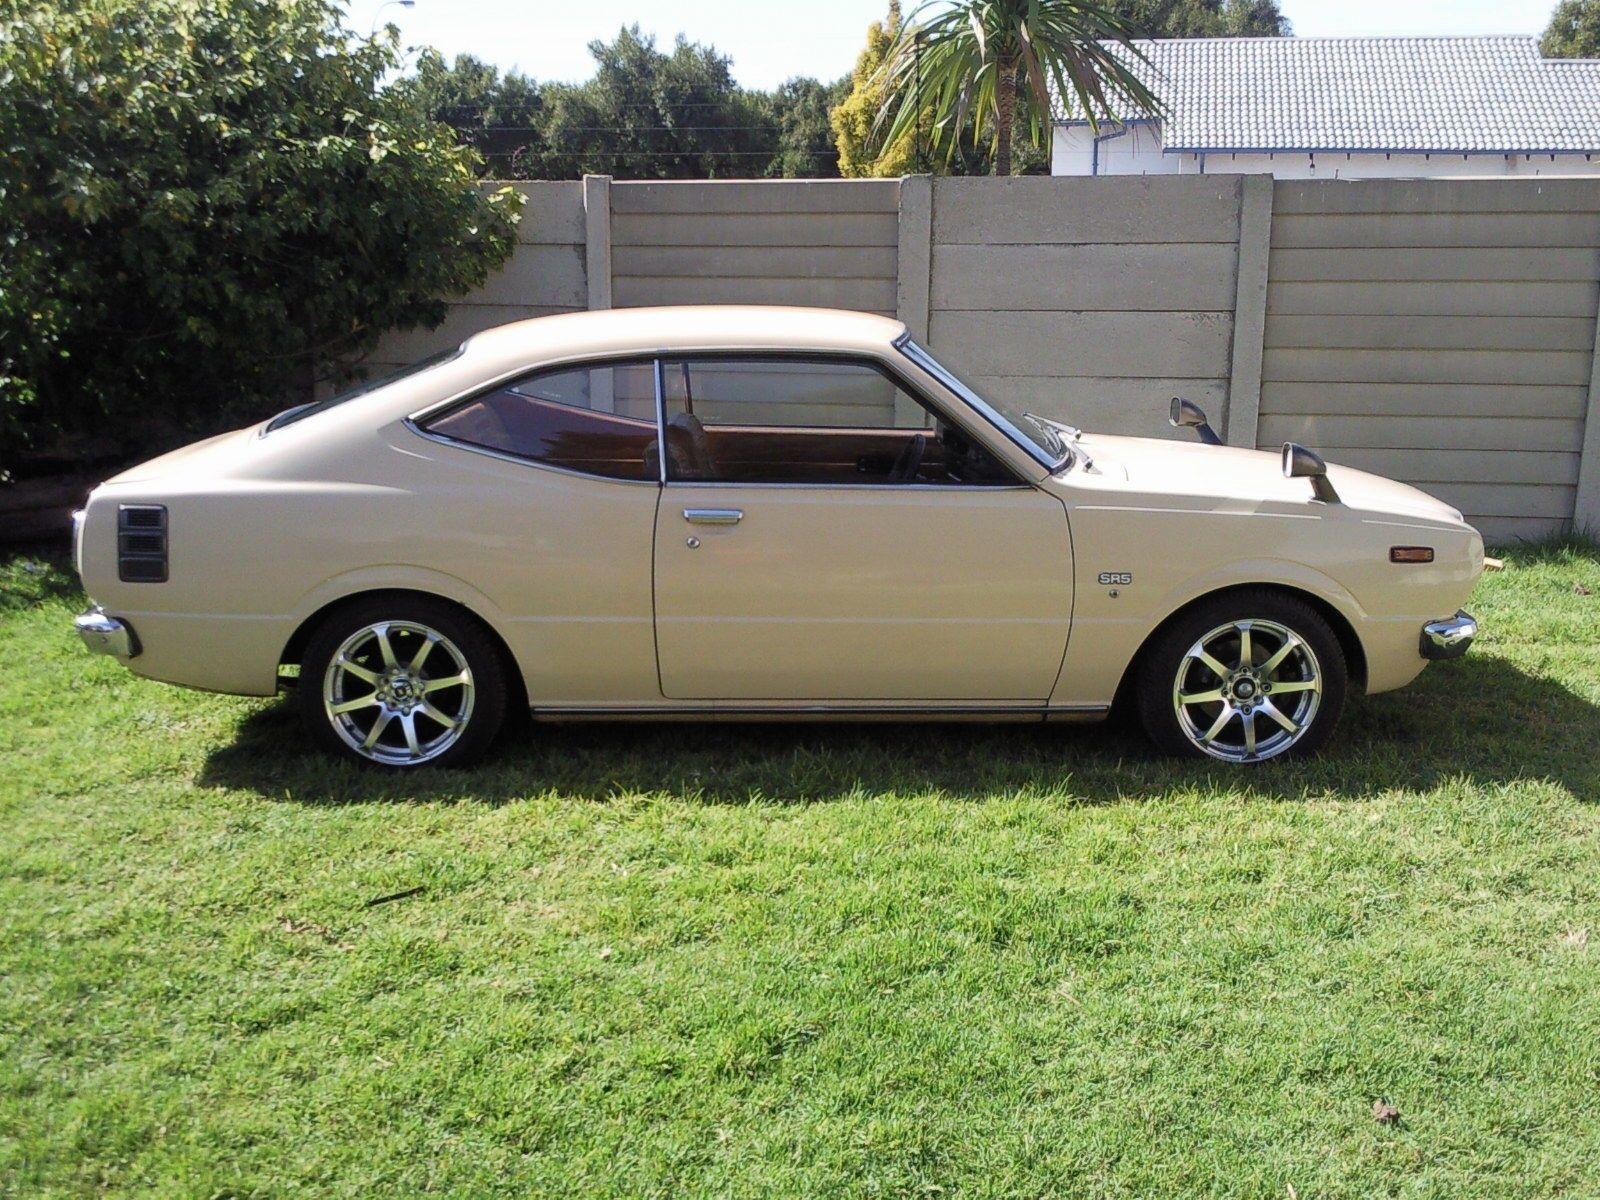 Kelebihan Toyota Corolla 1976 Spesifikasi